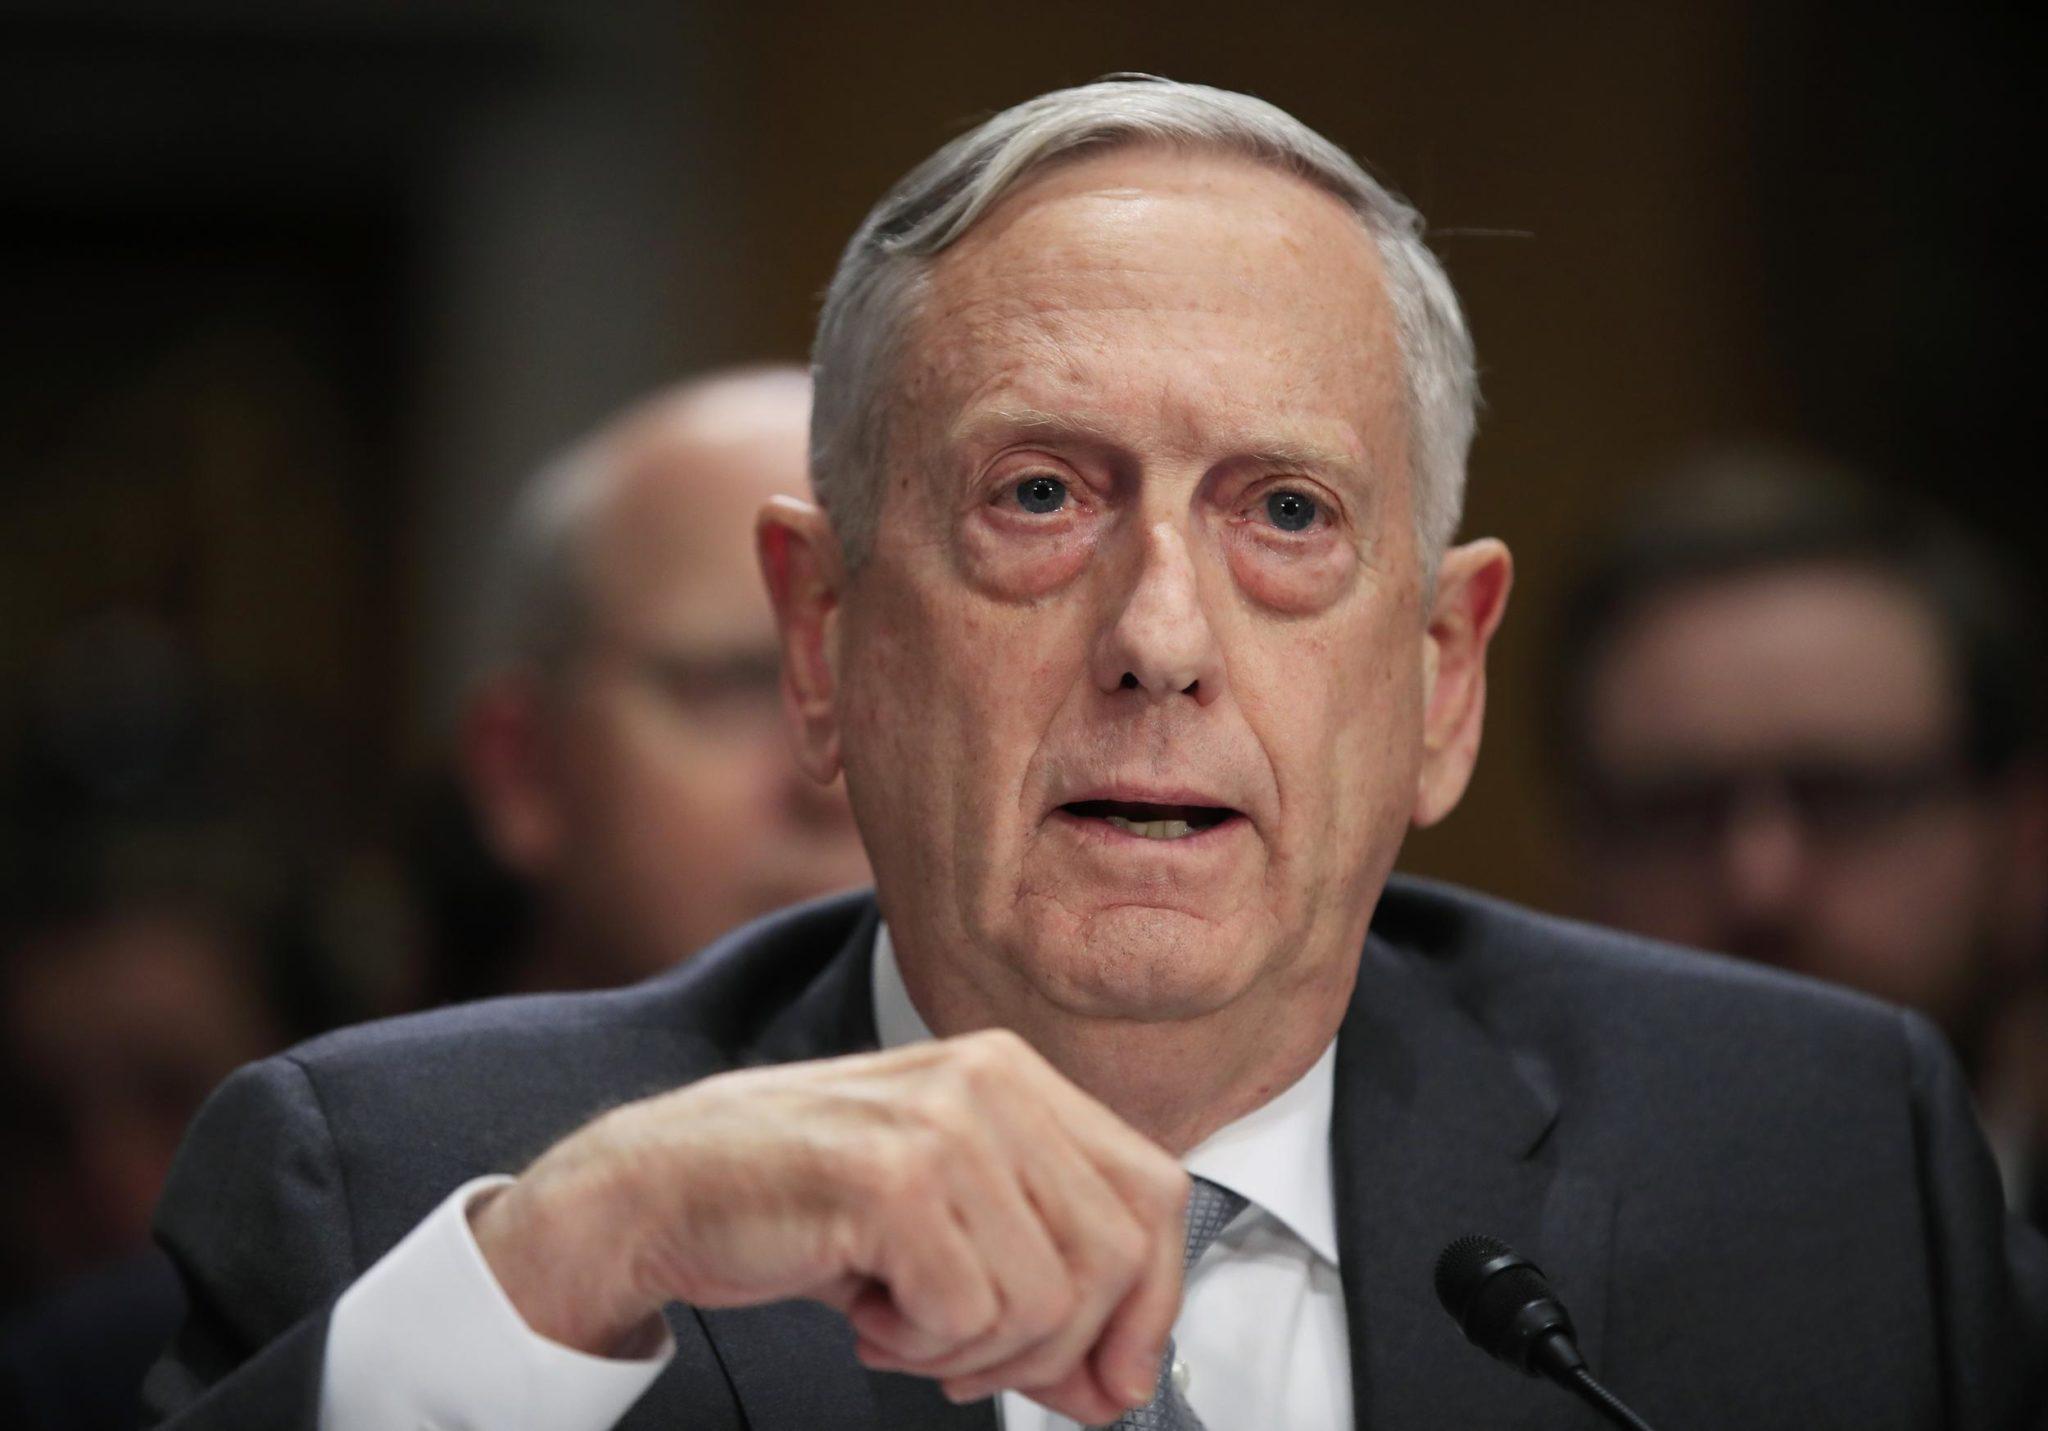 Mattis: US Relations With China Not Worsening Despite Bumps